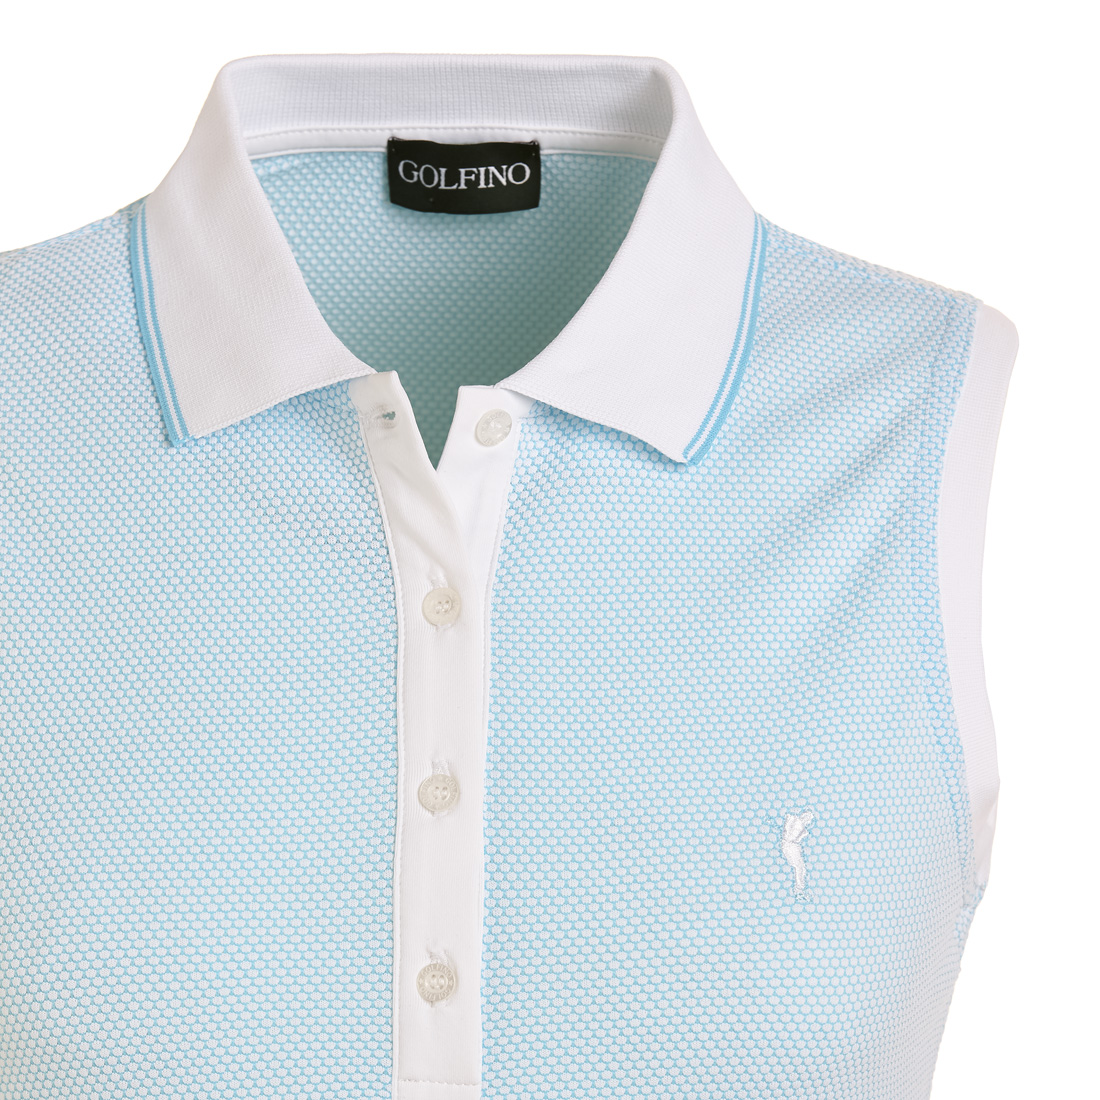 Ärmelloses Damen Funktions-Golfpoloshirt in Regular Fit mit Bubble Jacquard